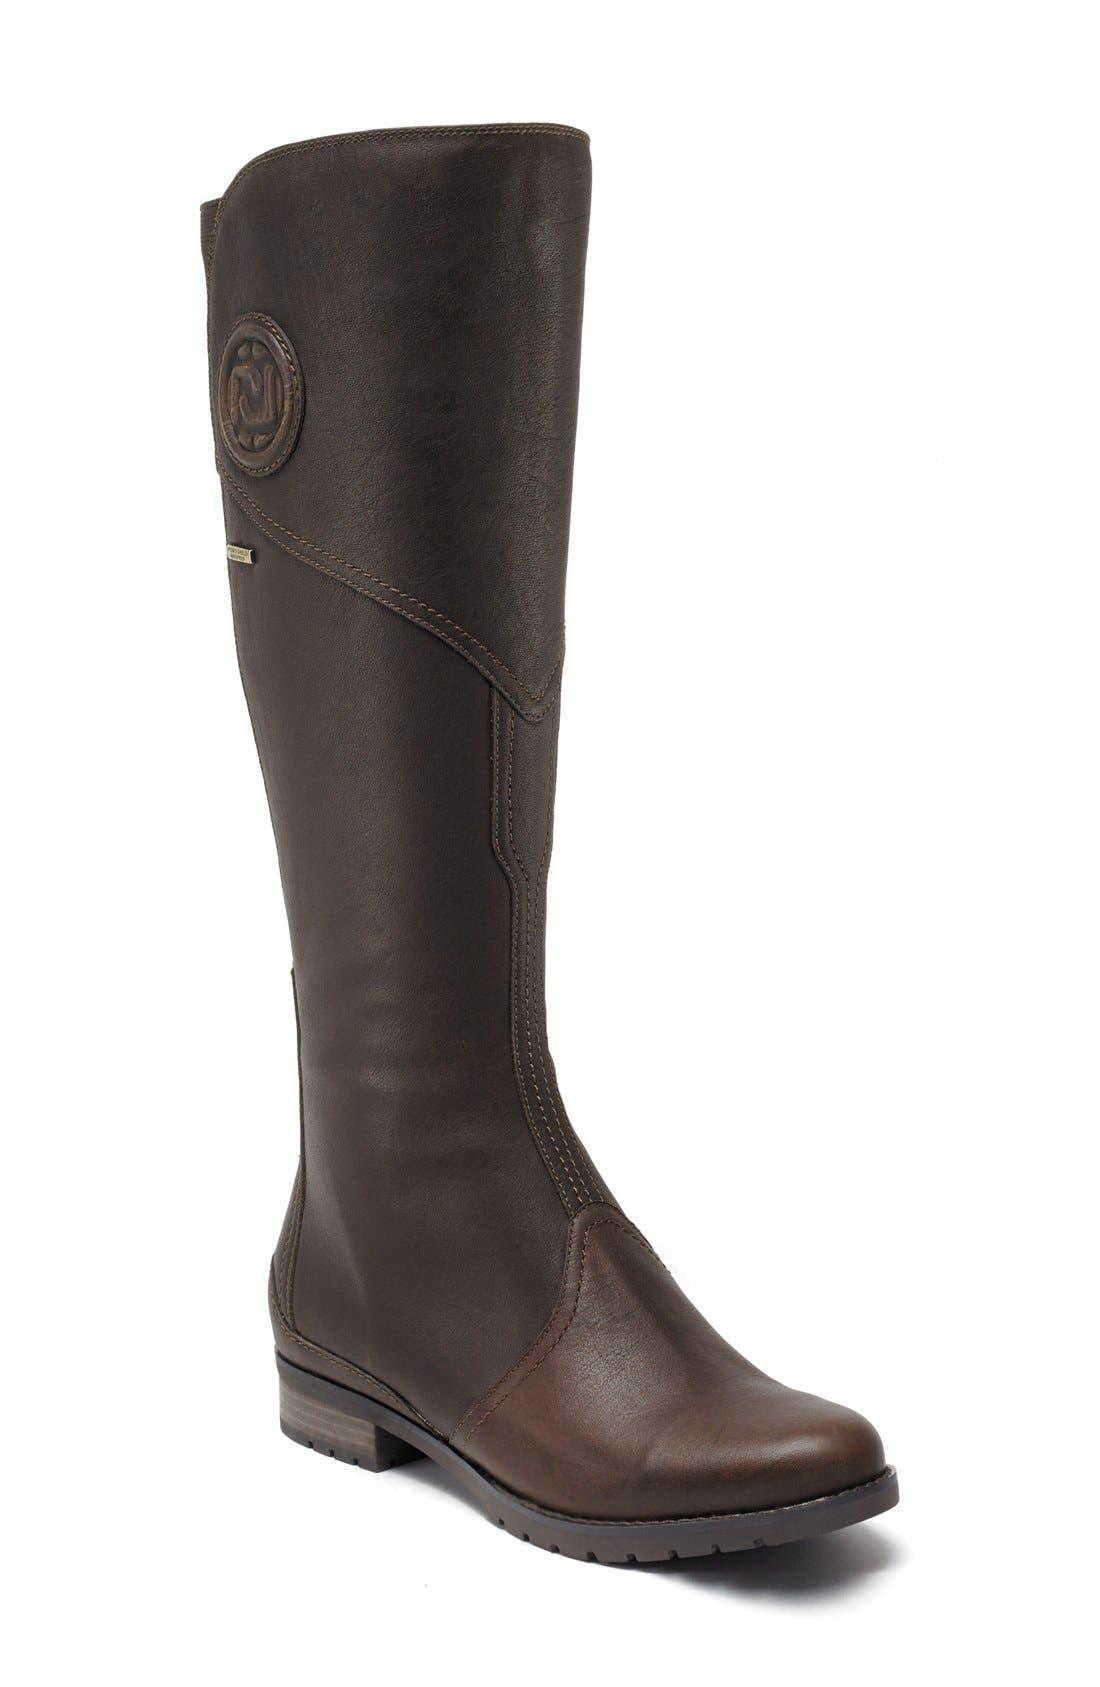 Main Image - Rockport 'Tristina Gore' Waterproof Riding Boot (Women)